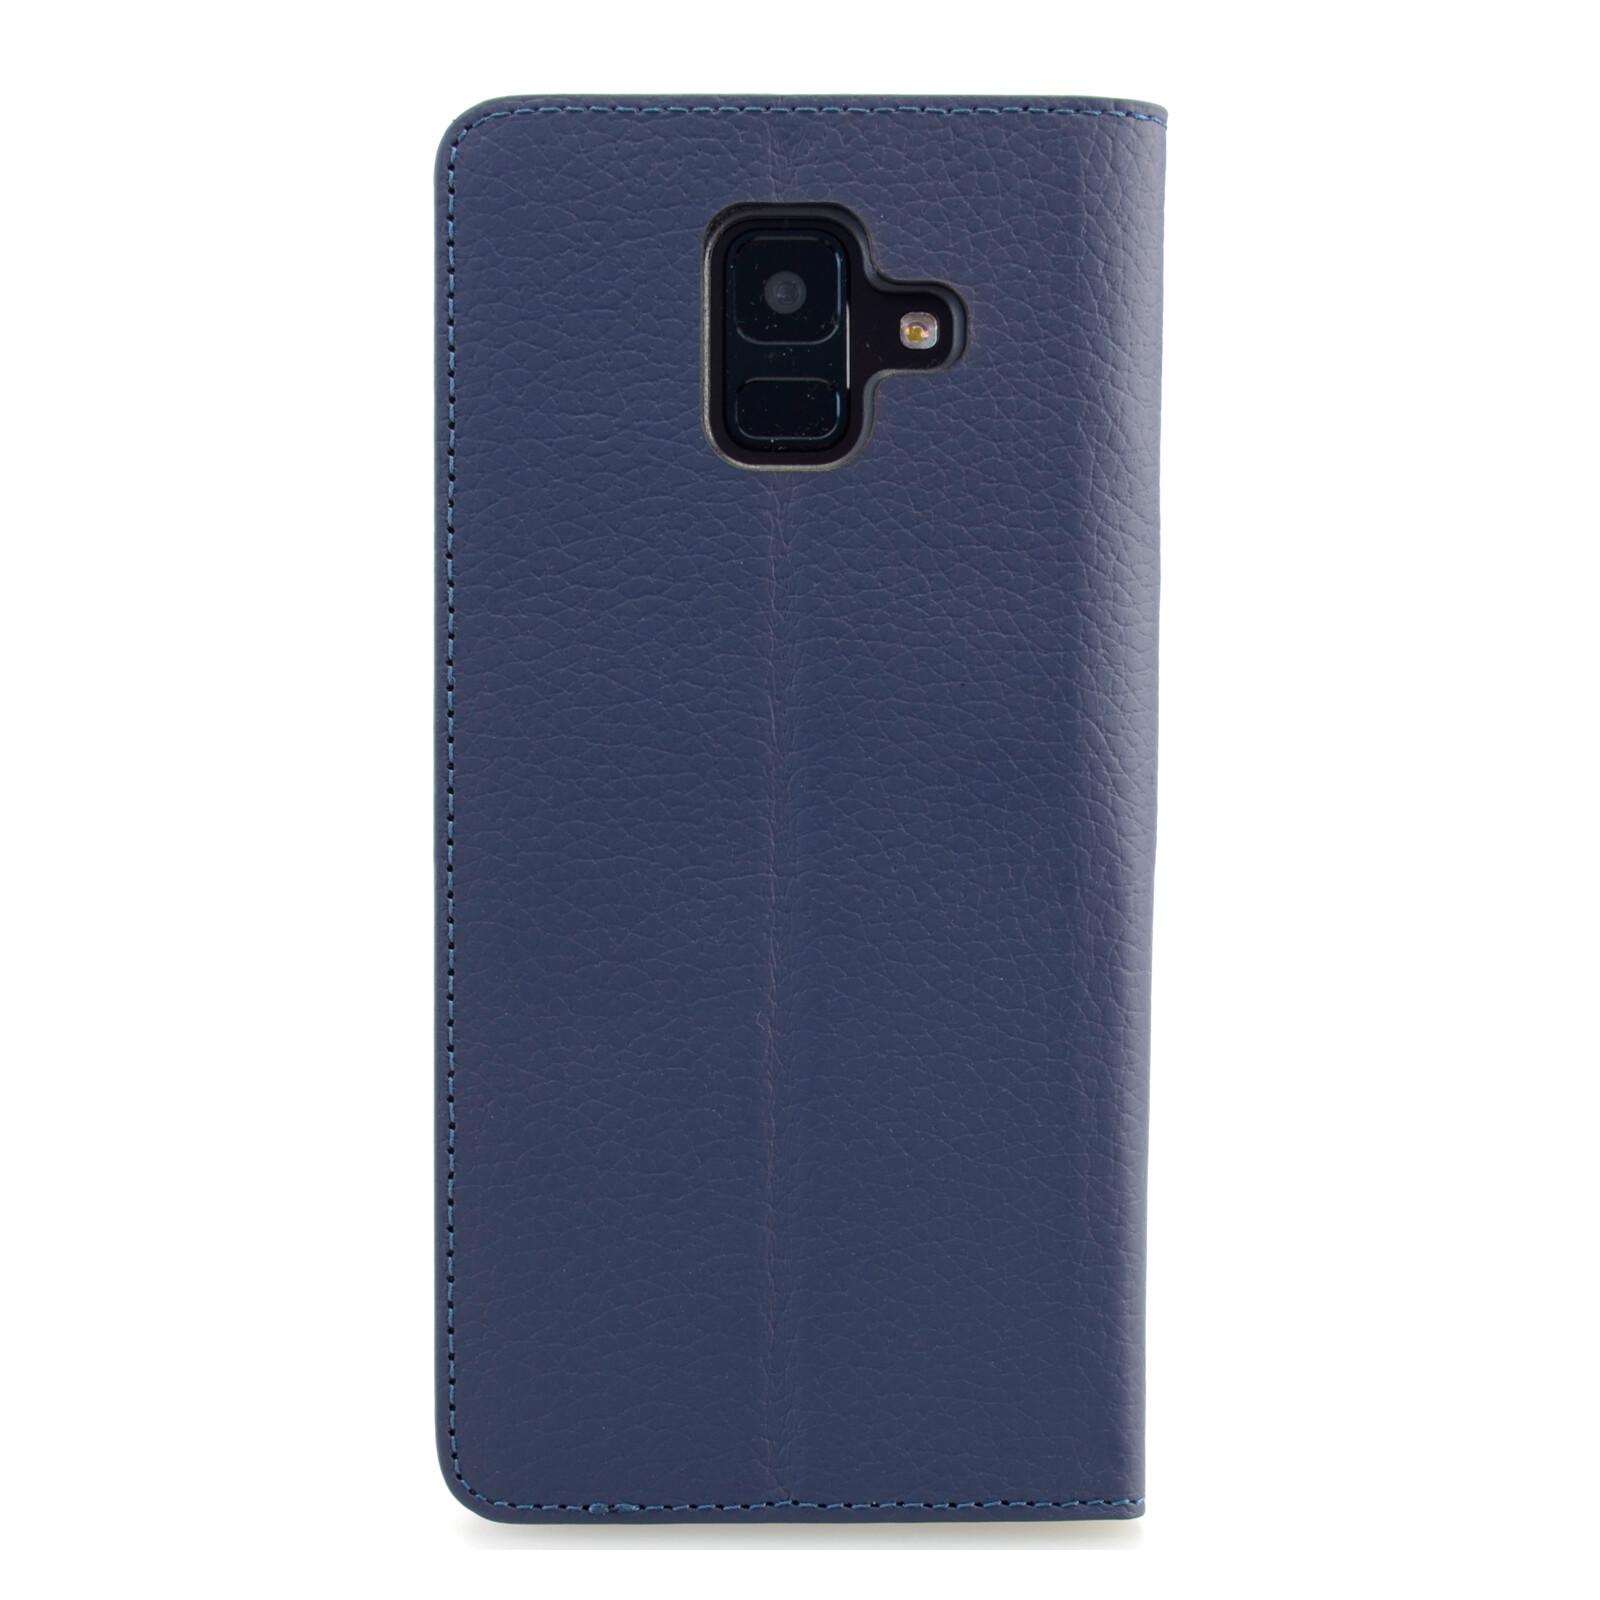 Galeli Book Tasche Marc Samsung Galaxy J6 blau